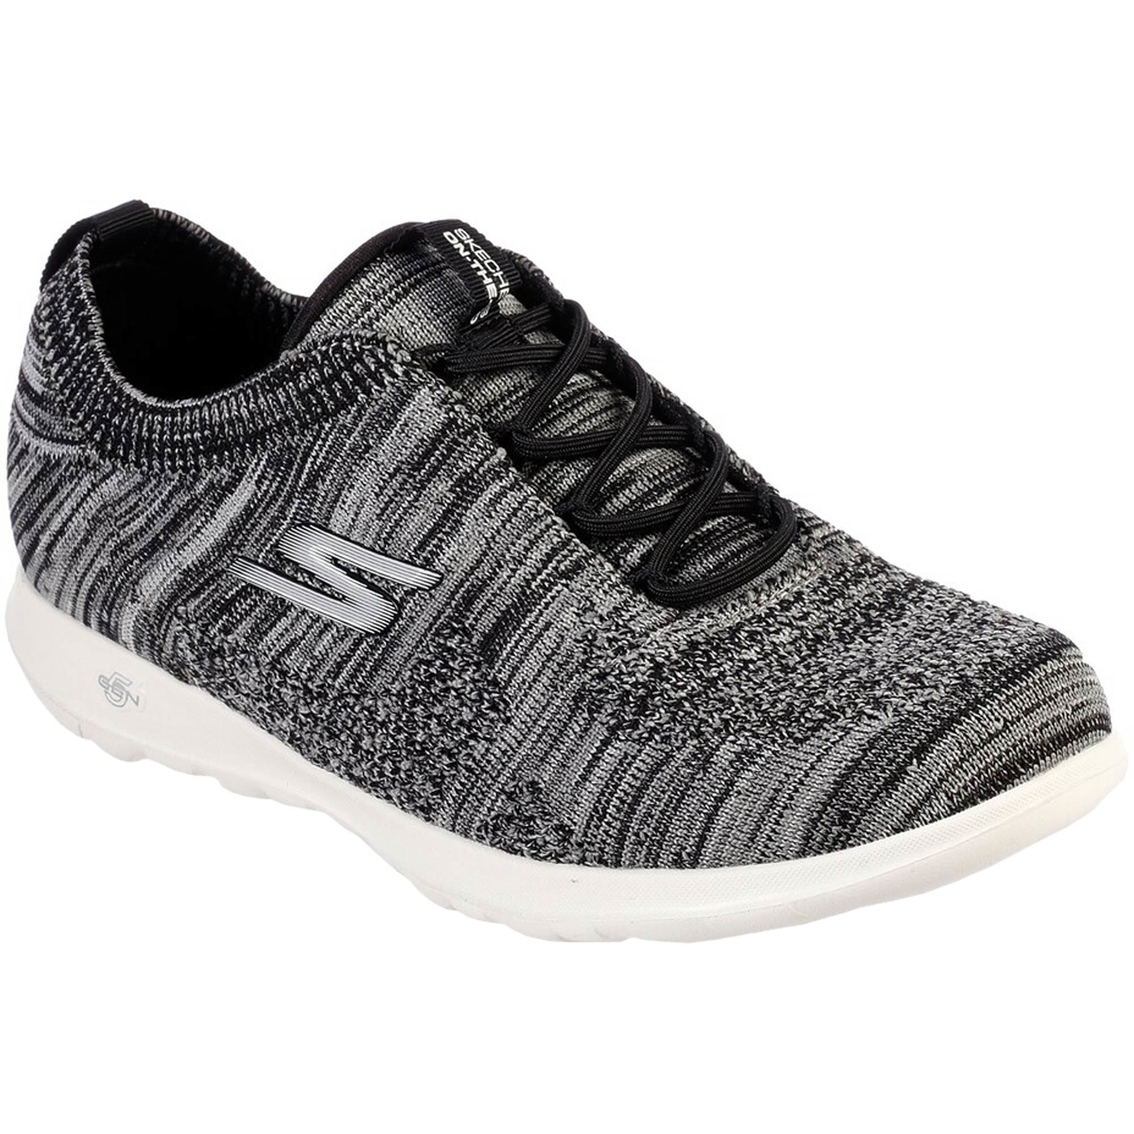 Skechers Go Walk Lite Dawn | Sneakers